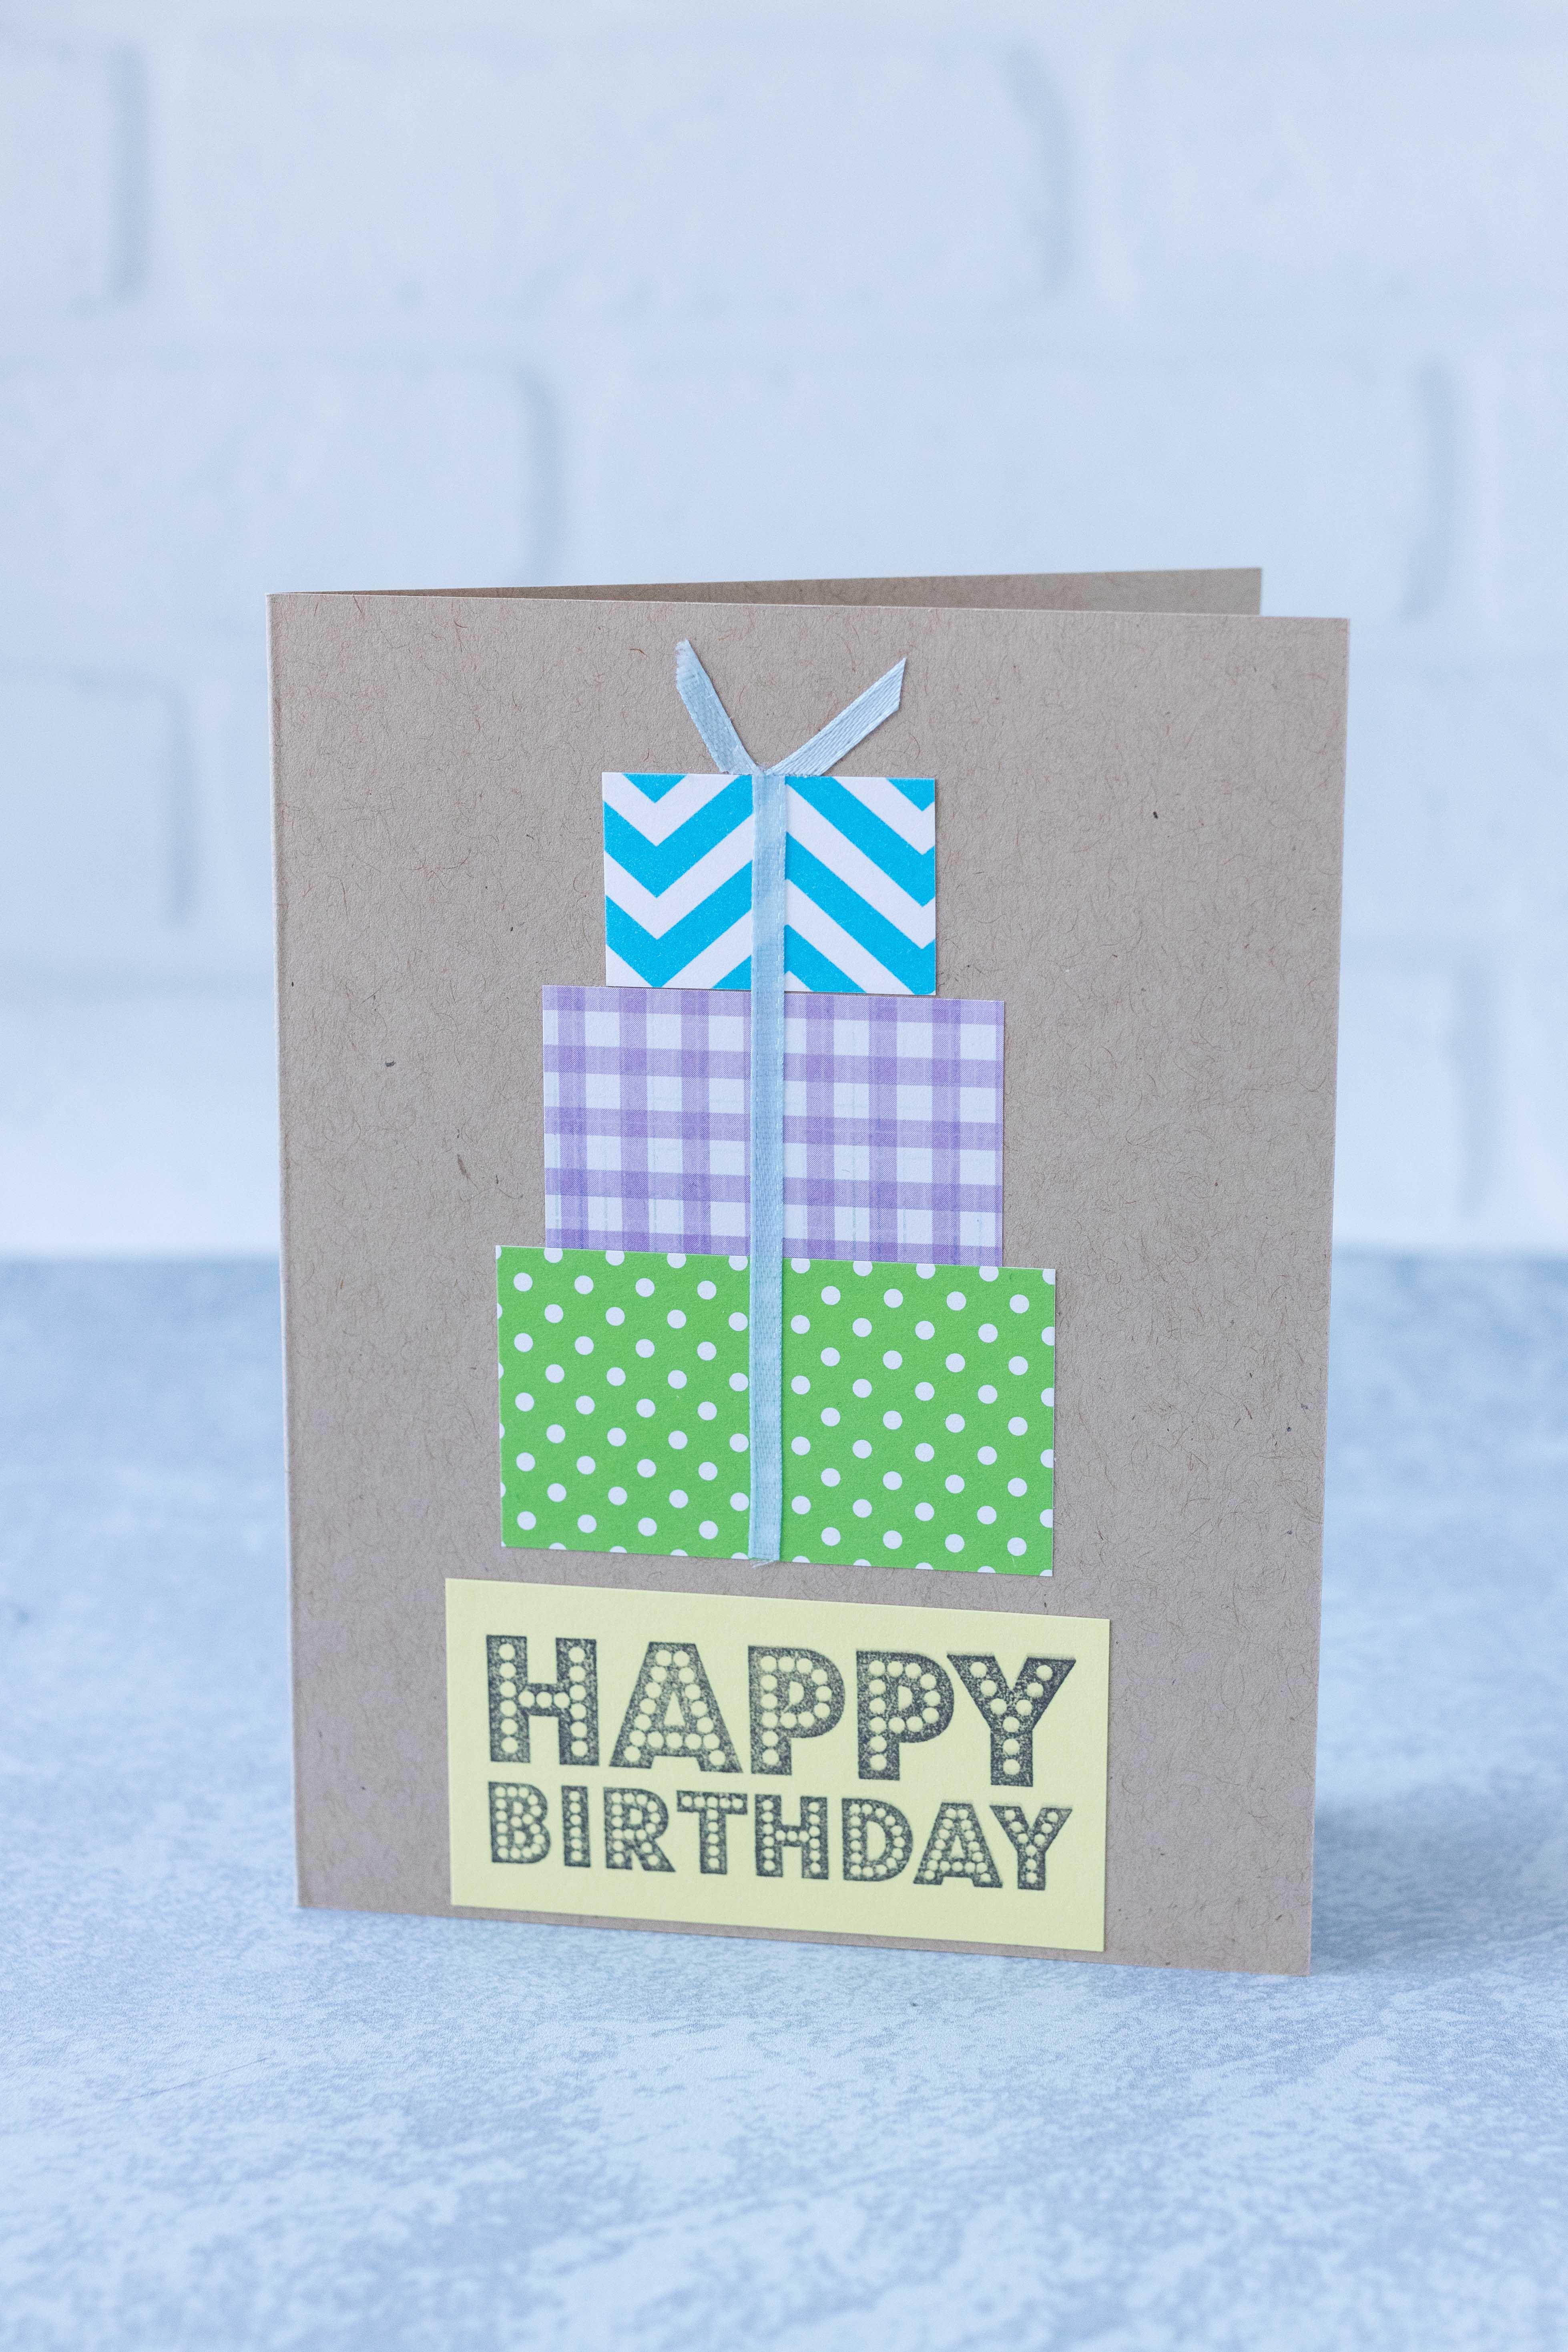 Groovy 10 Simple Diy Birthday Cards Rose Clearfield Birthday Cards Printable Nowaargucafe Filternl